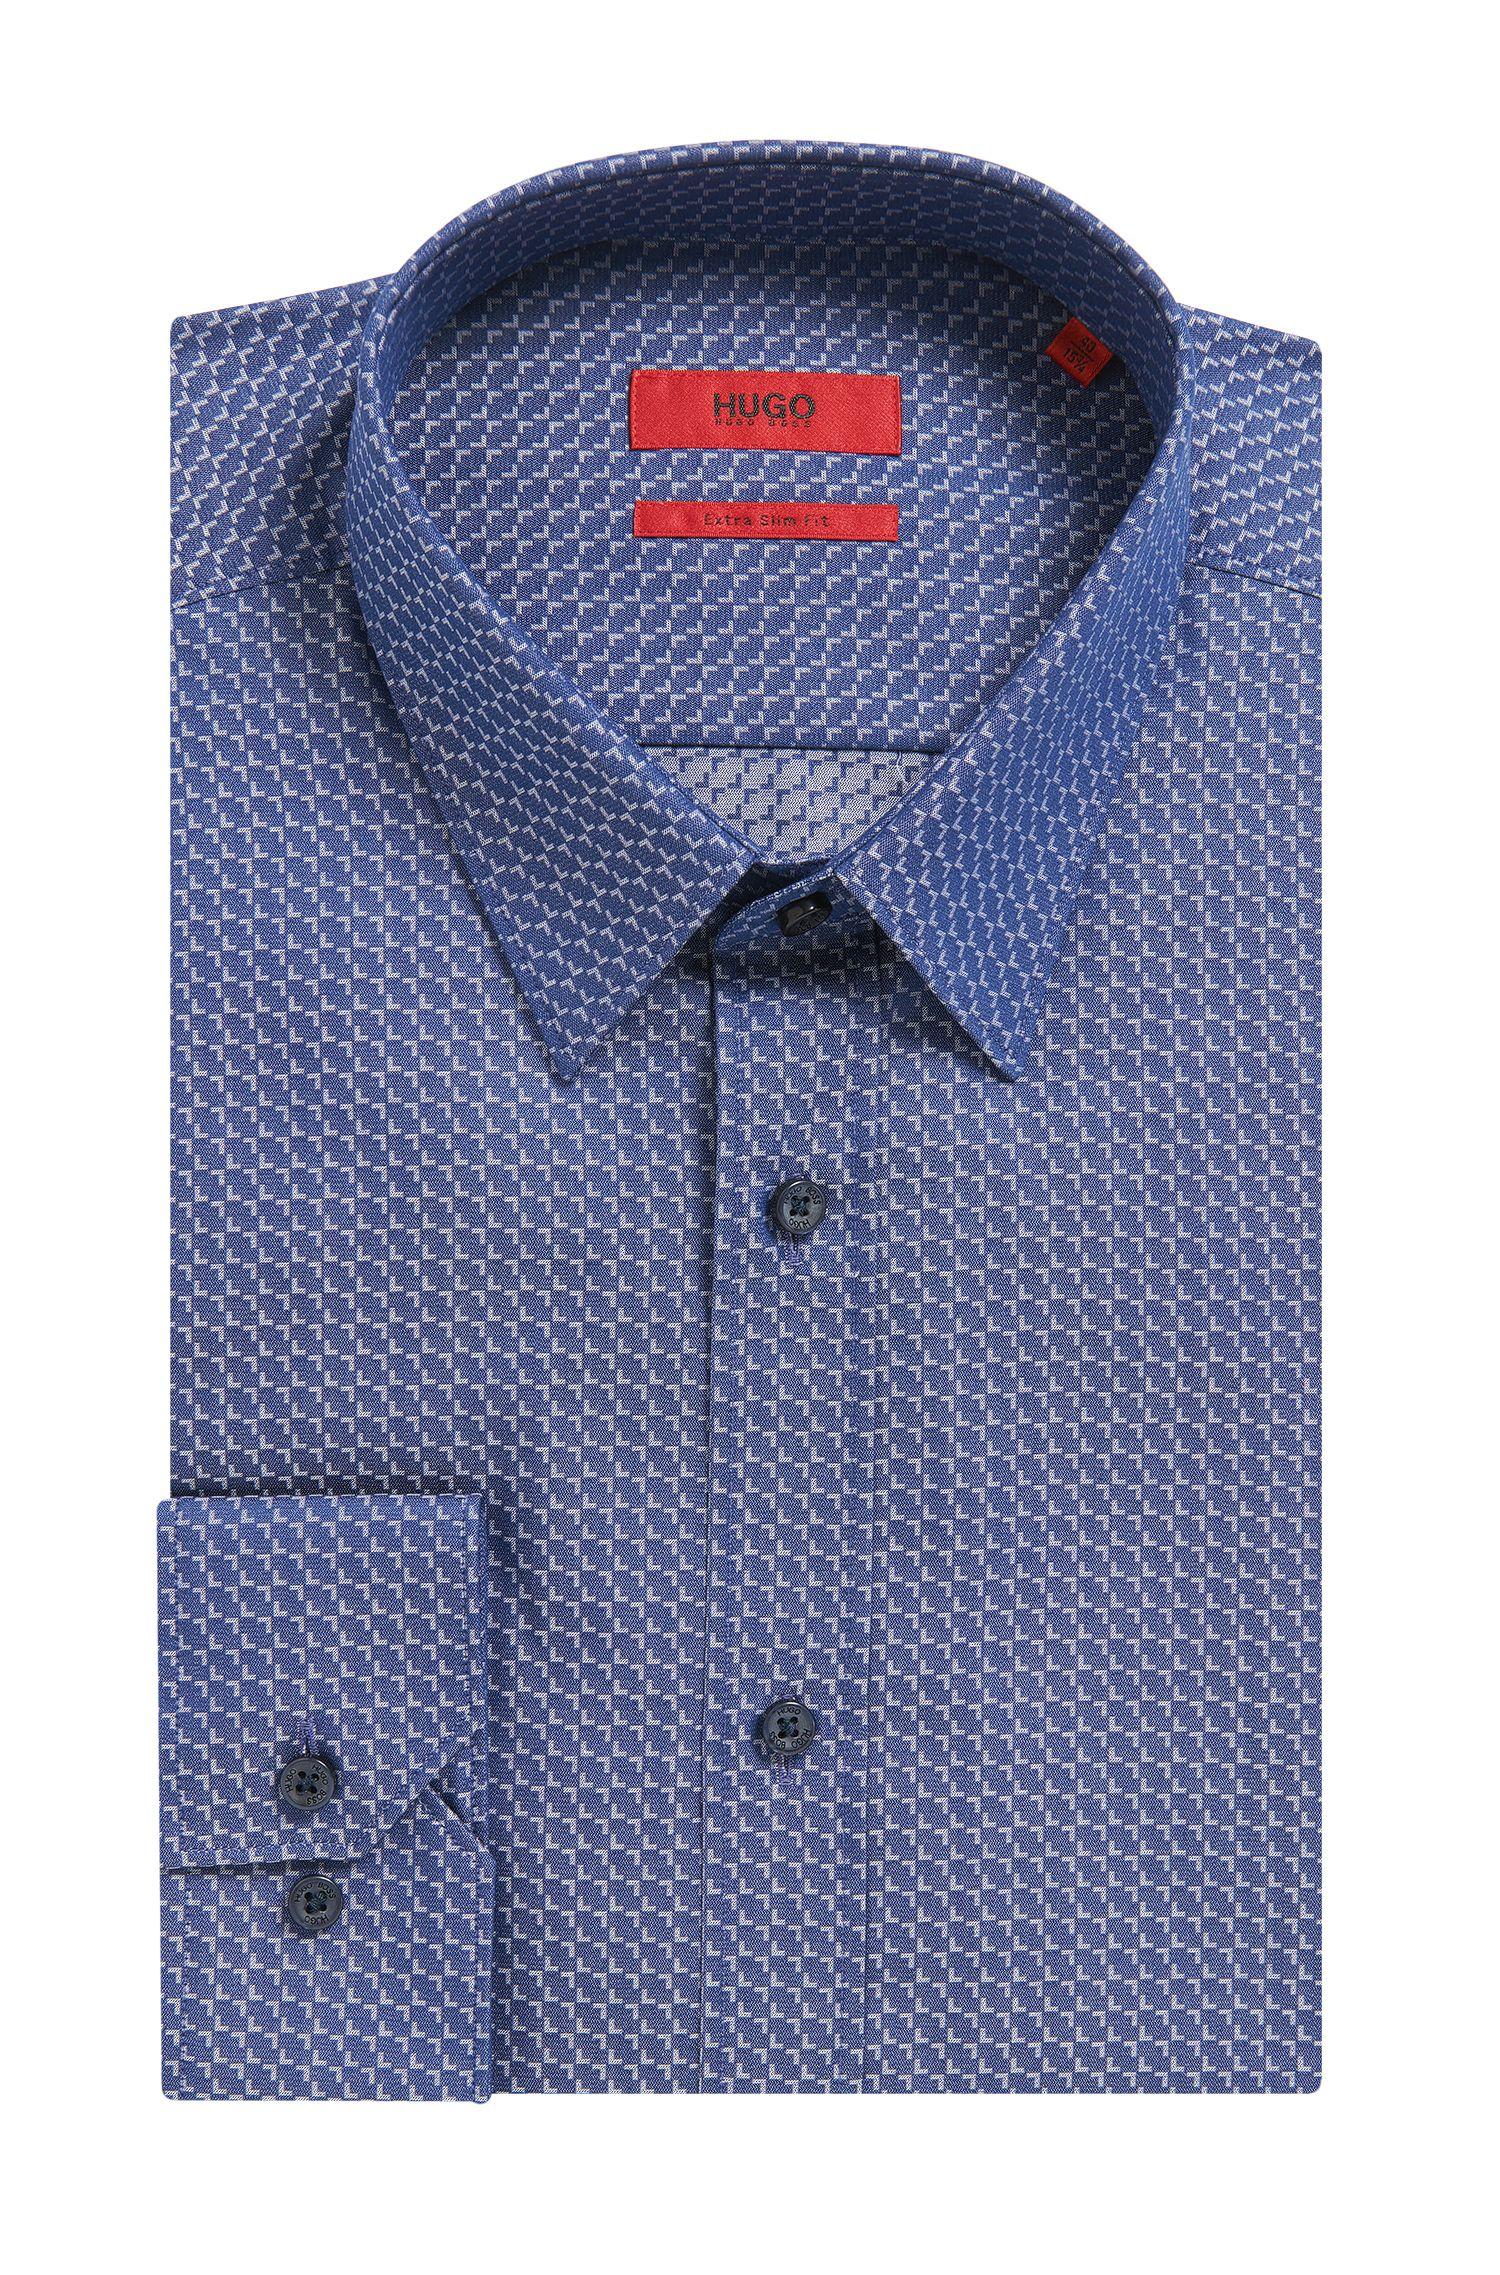 'Elisha' | Extra Slim Fit, Patterned Cotton Dress Shirt